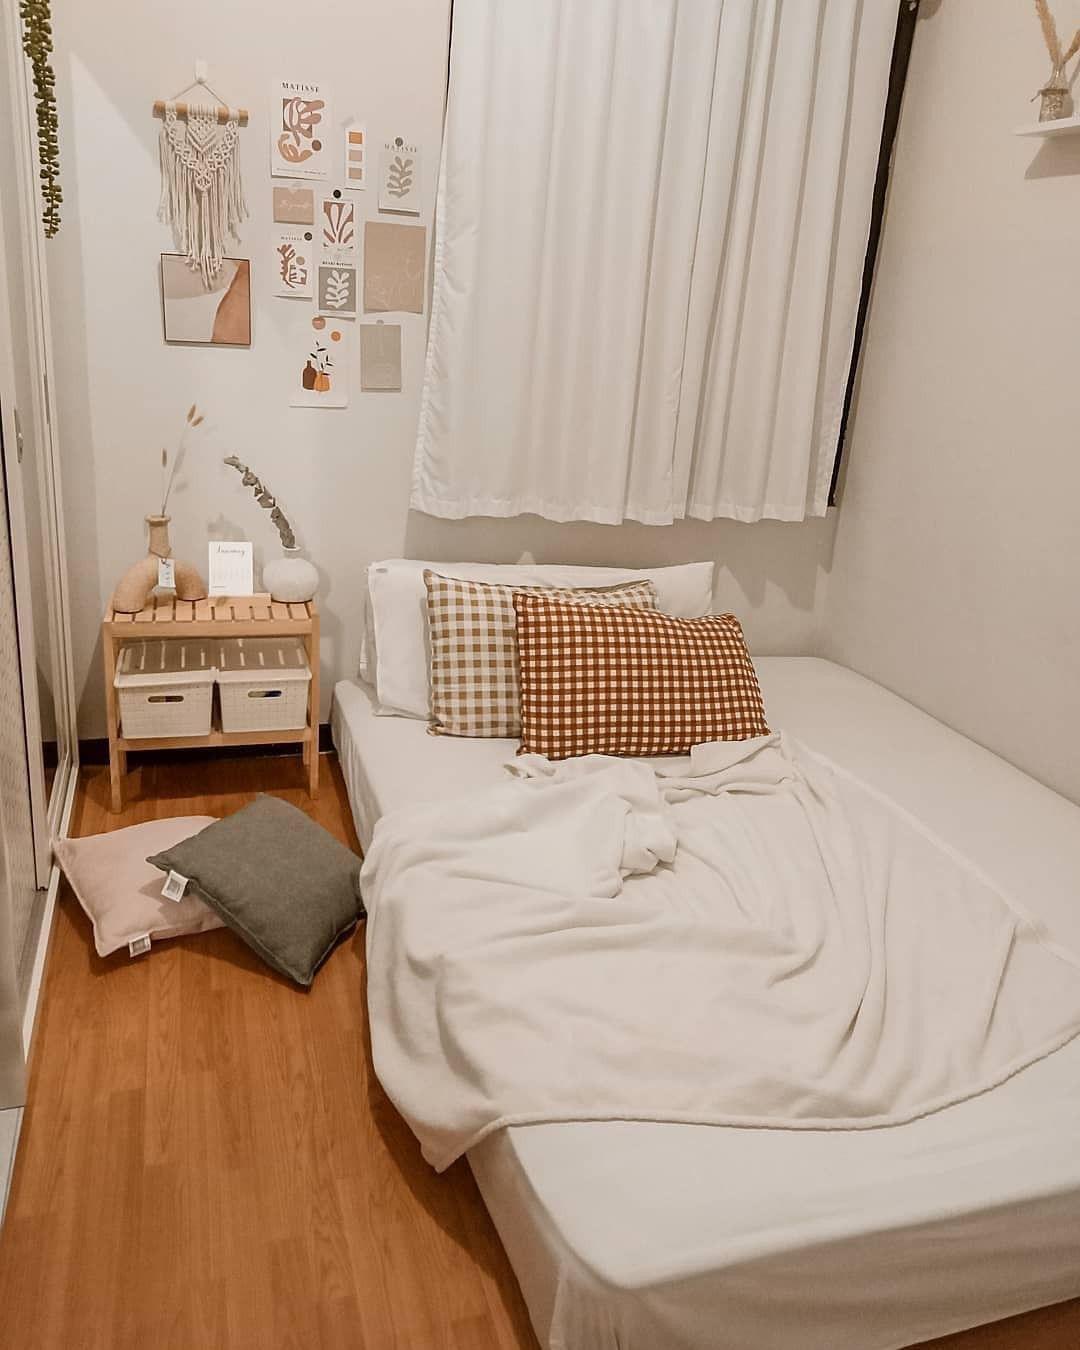 58 Comfy Minimalist Bedroom Decor Ideas Small Rooms Small Bedroom Decor Small Master Bedroom Small Bedroom